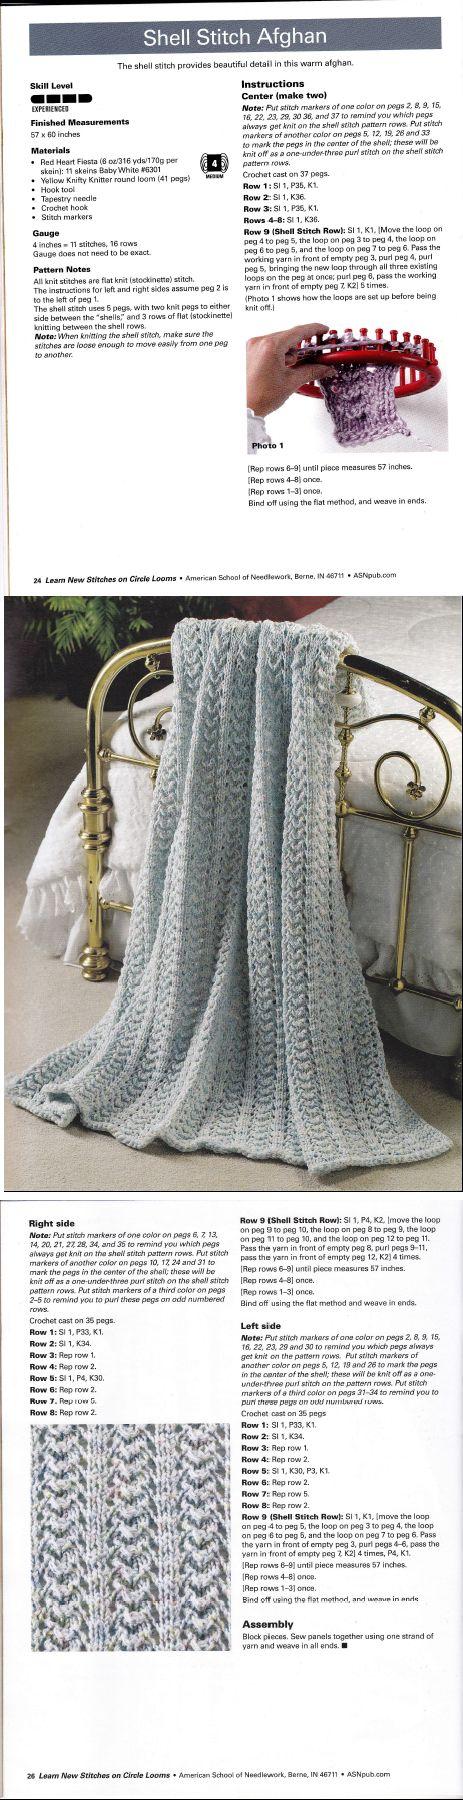 610 mejores imágenes sobre 1 crochet knitting en Pinterest | Telares ...